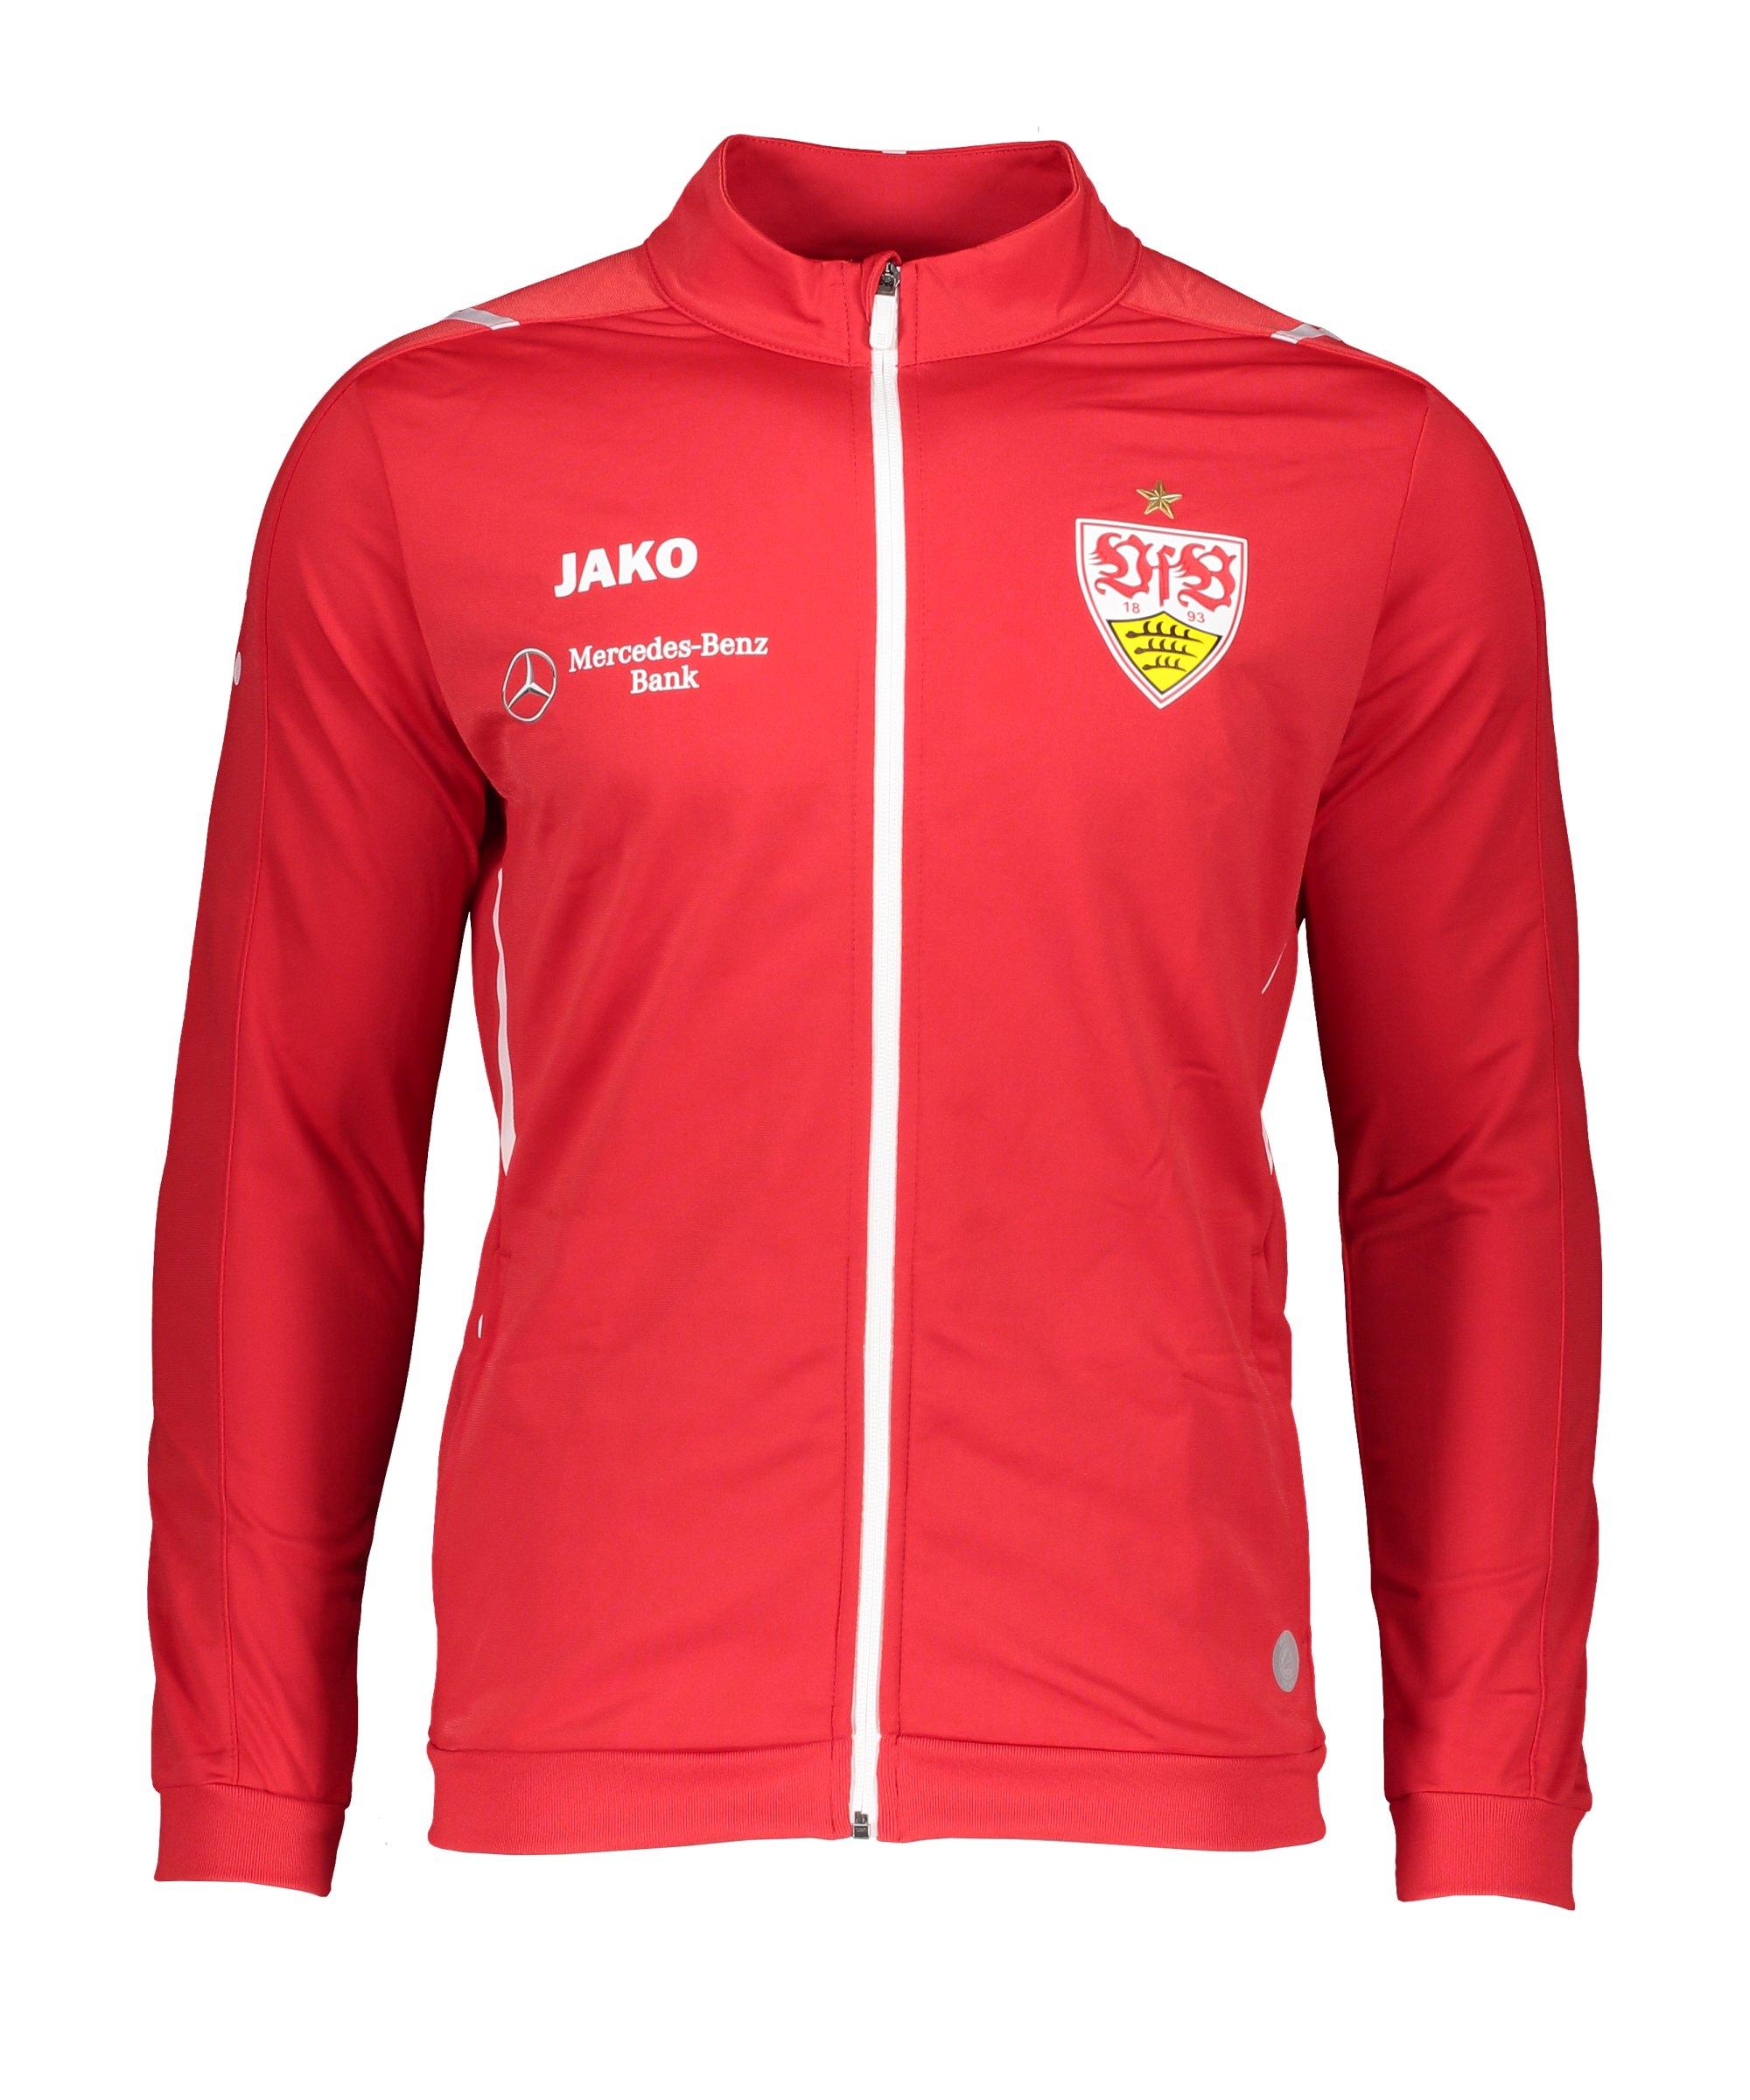 JAKO VfB Stuttgart Challenge Polyesterjacke Rot Weiss F102 - rot